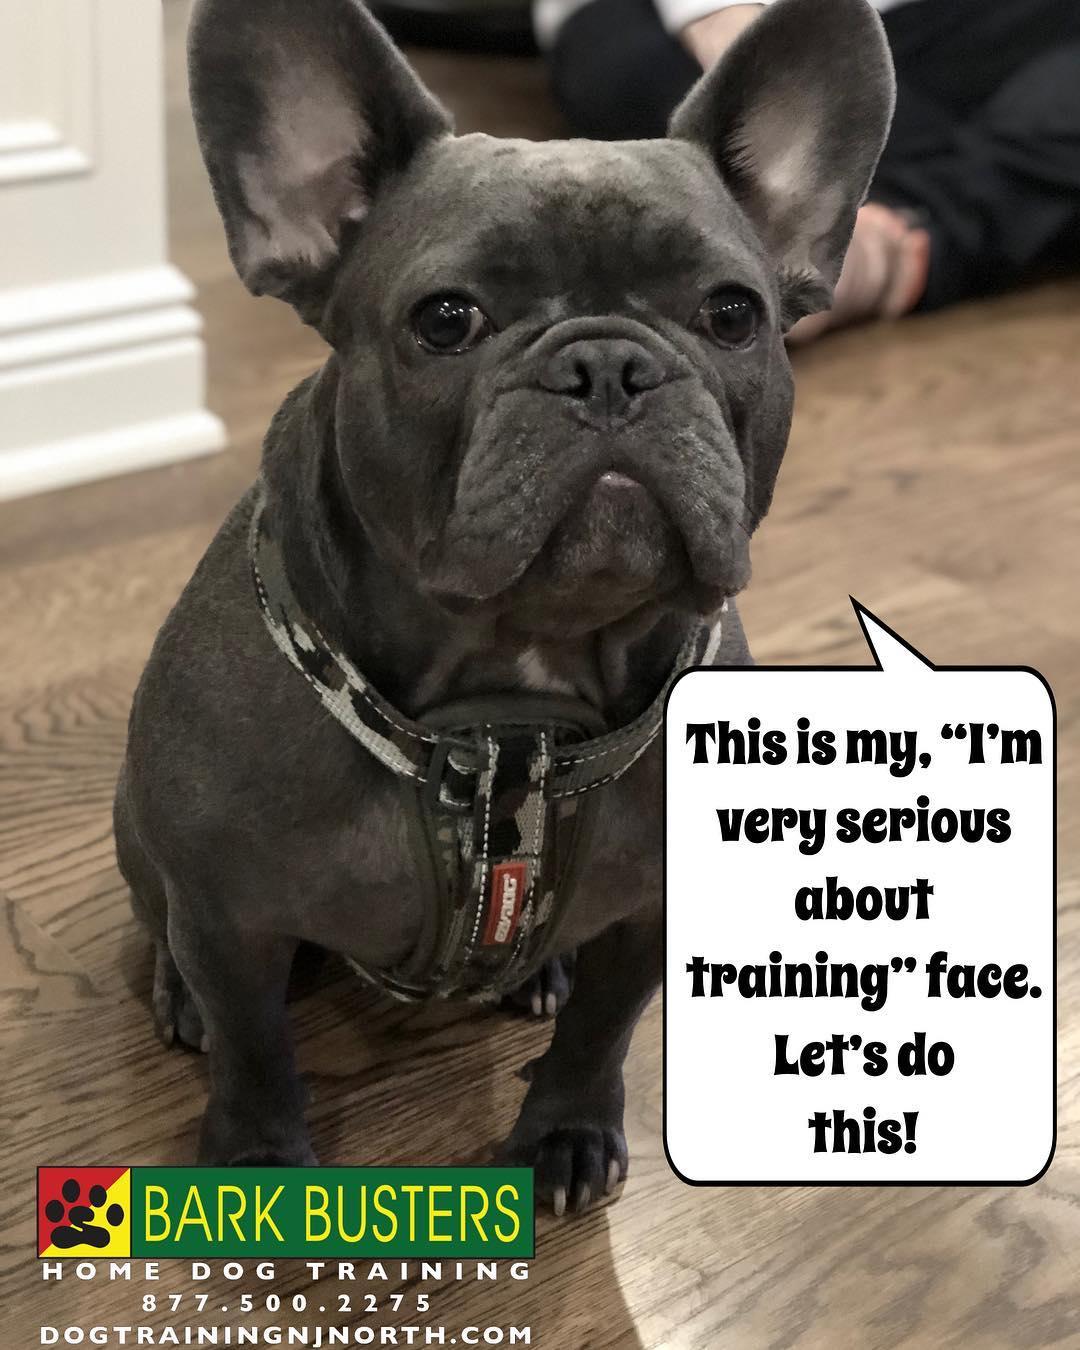 #BarkBusters #dogtraining #dogtrainerNorthernNewJersey #speakdog #dogs #puppies #HappyDogsHappyFamilies #FrenchBulldog #dogsOfBarkBusters #HoHoKus